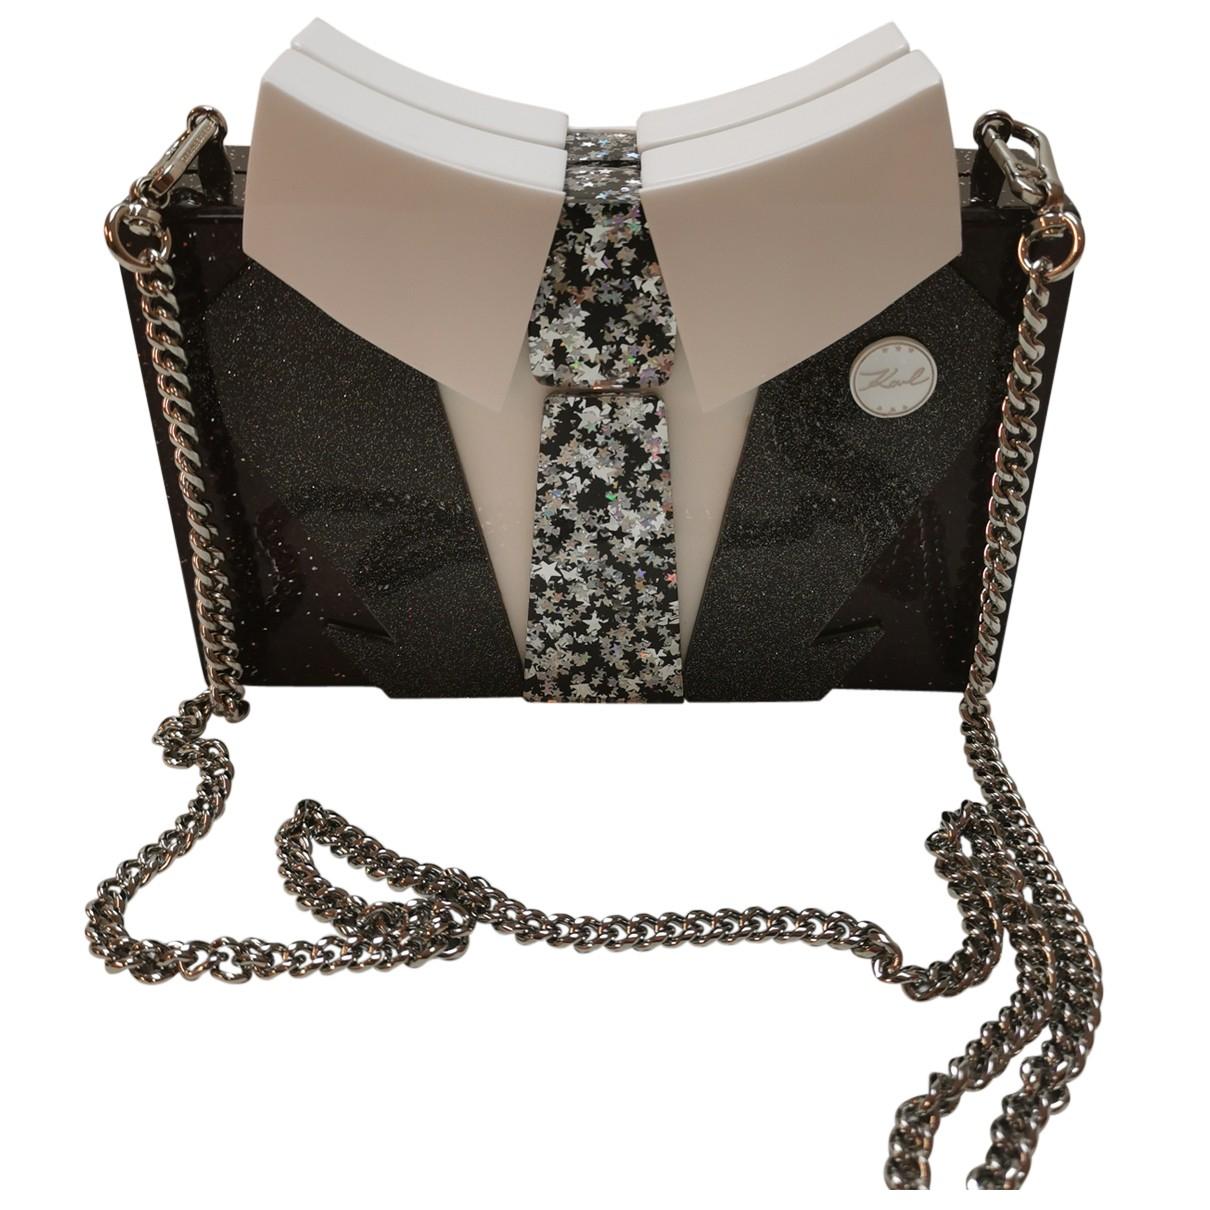 Karl Lagerfeld N Burgundy Clutch bag for Women N